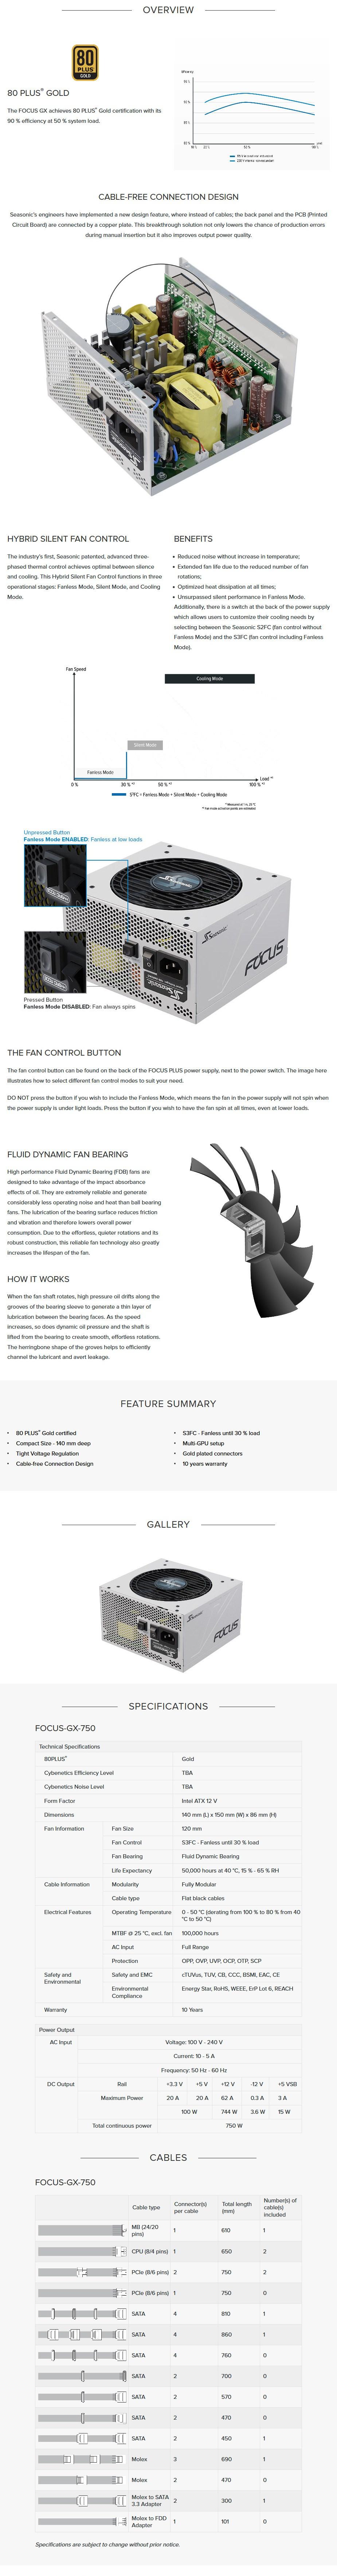 Seasonic SSR-750FX WHITE Focus GX 750W 80+ Gold Fully Modular Power Supply - Overview 1